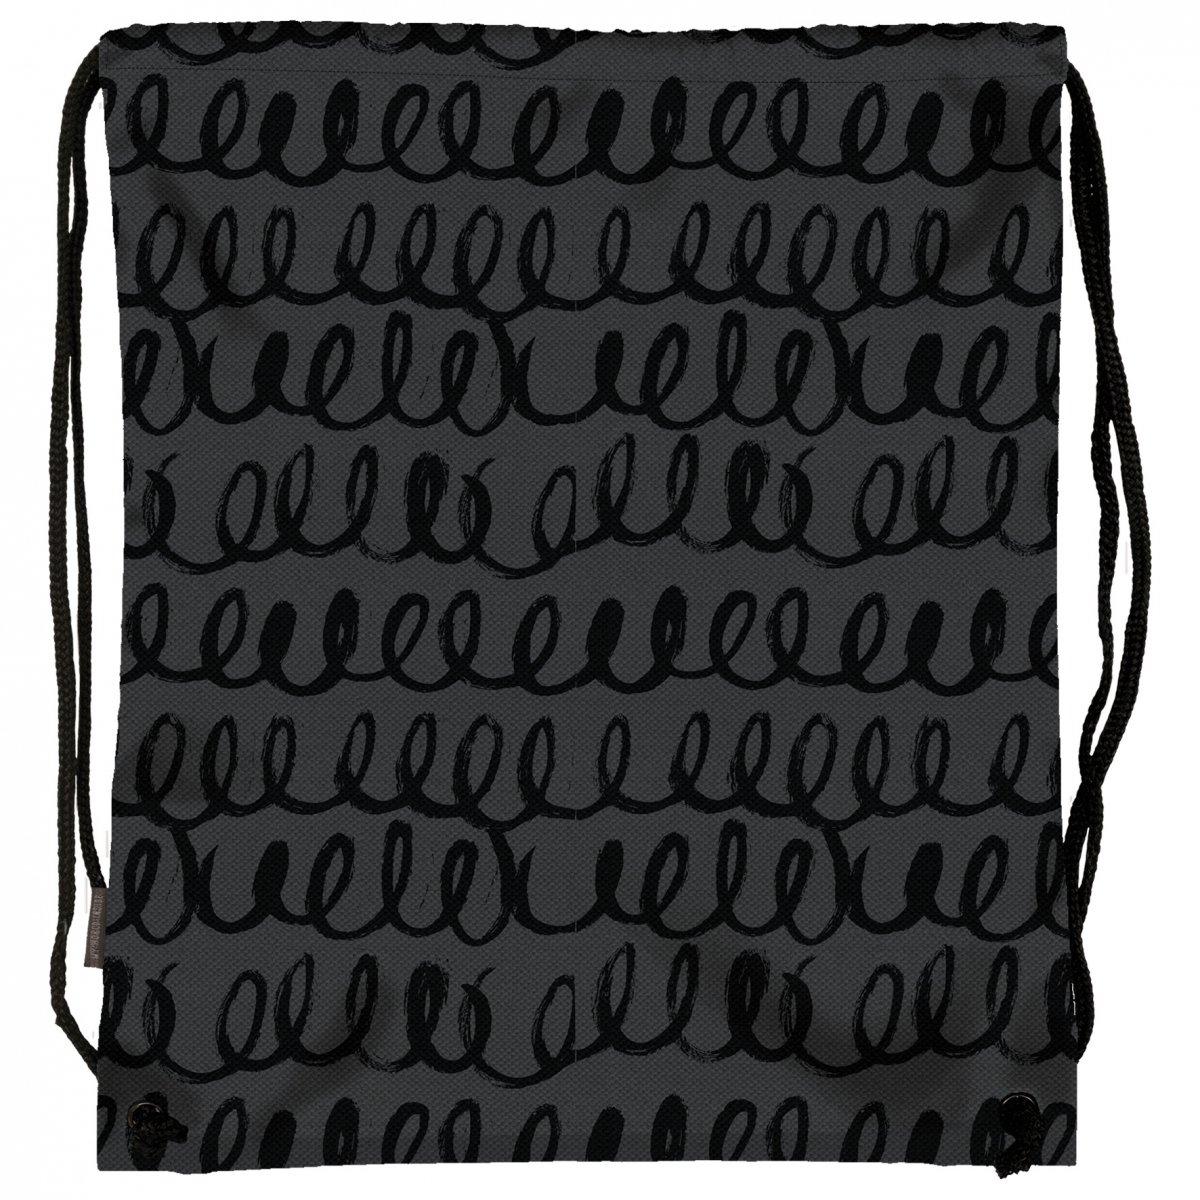 986e409bc04a8 Worek na obuwie Back UP czarne szlaczki BLACK TRAIL (WOB1A55 ...